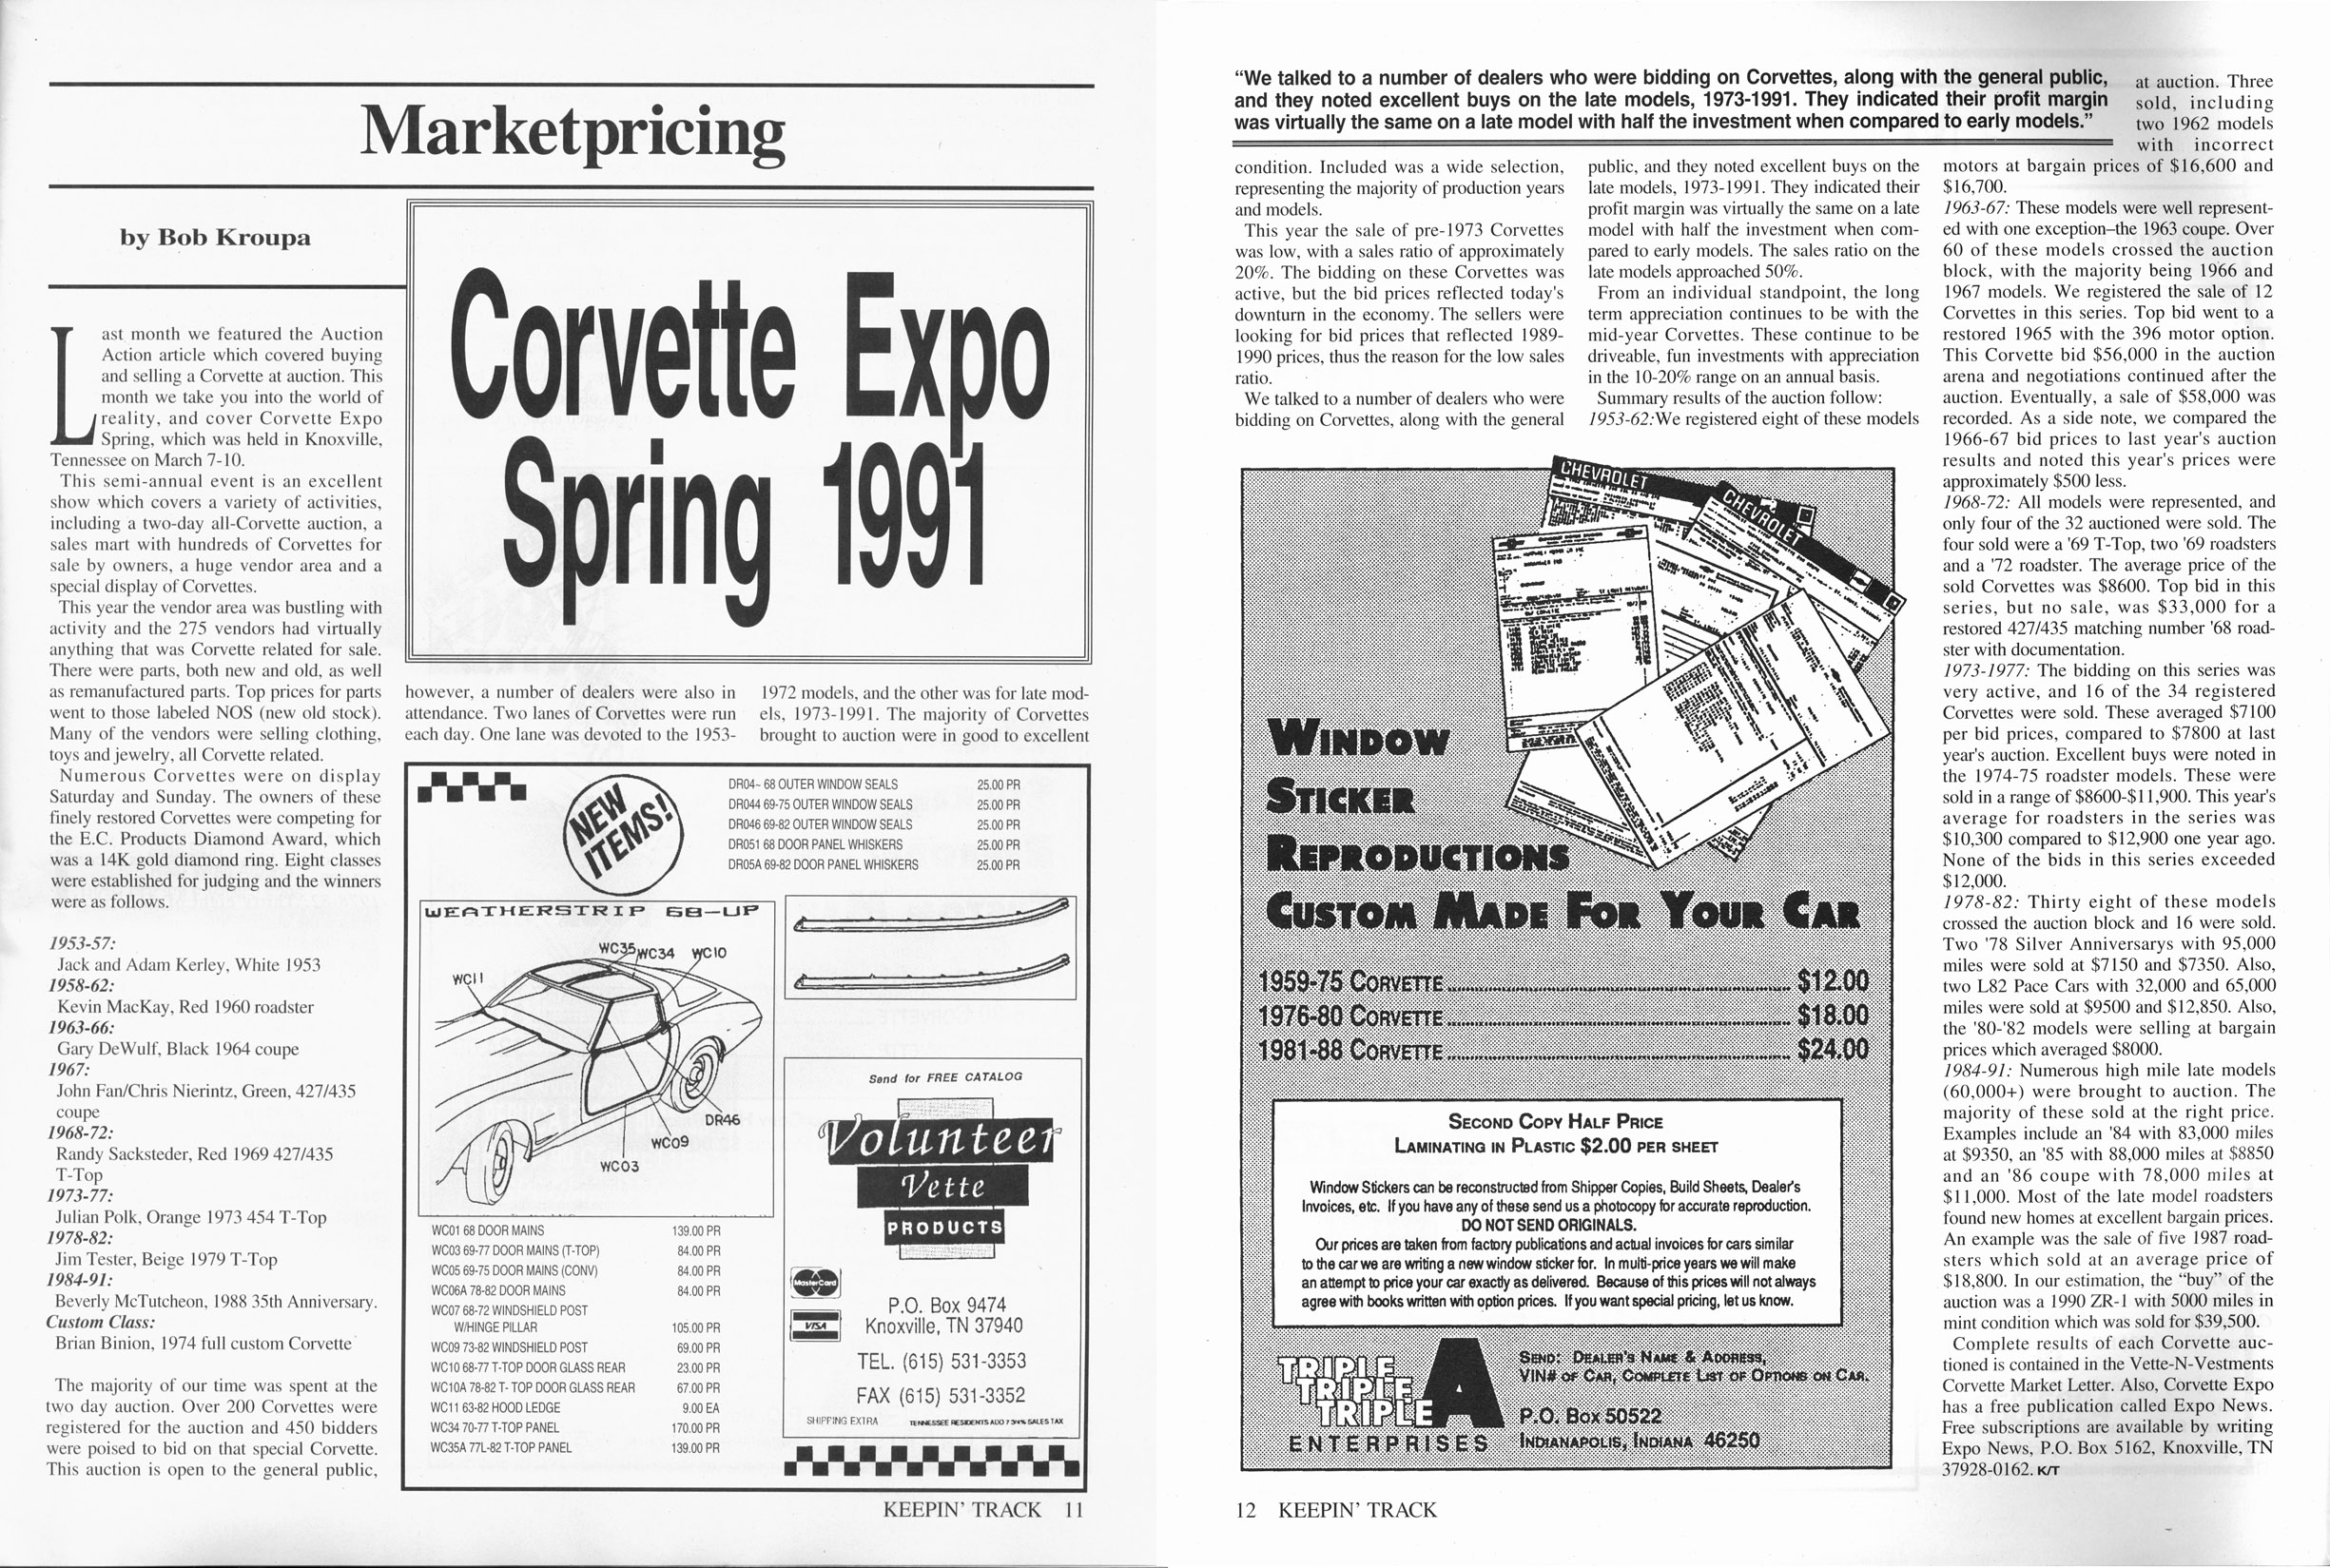 Keepin'Track Vettes July 1991: Corvette Expo Spring 1991